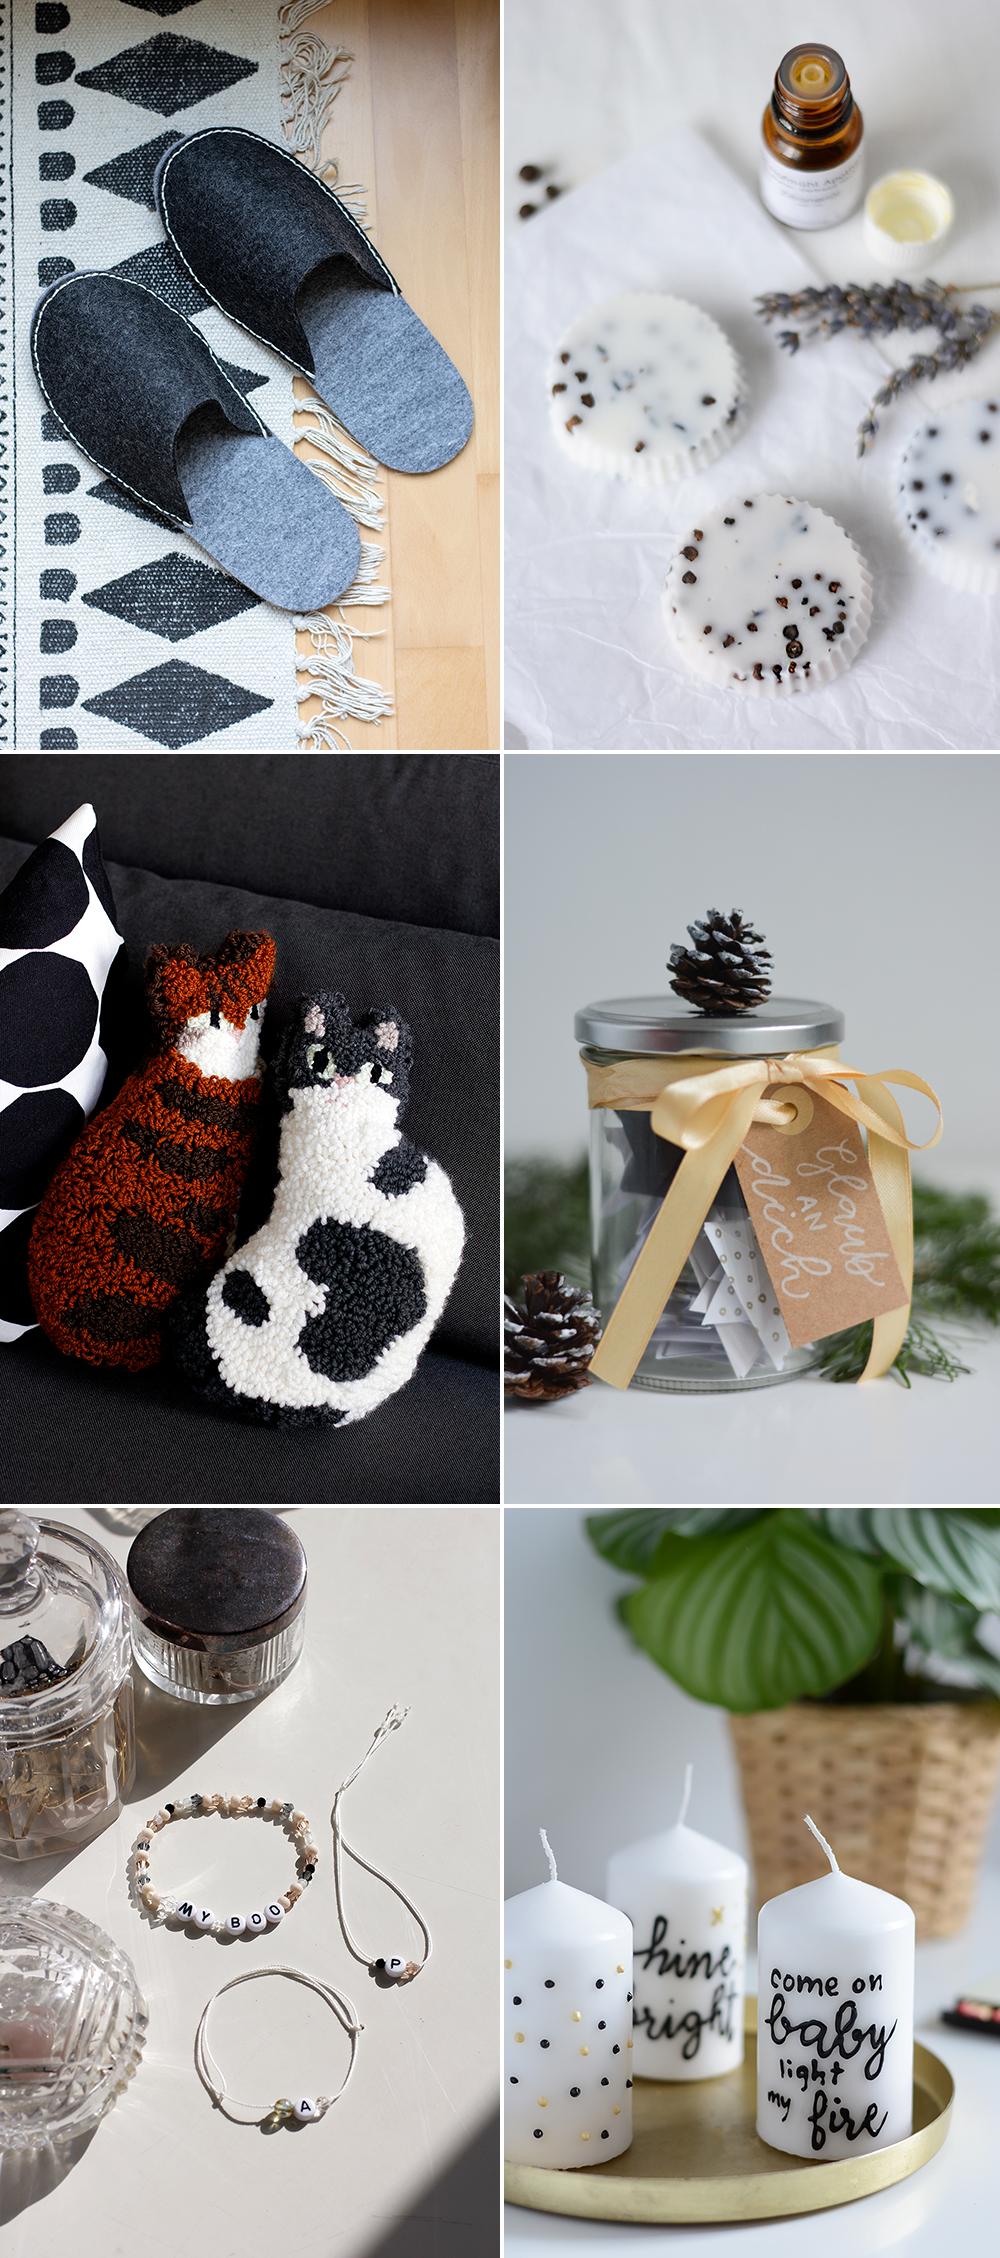 Personalisierte DIY-Geschenke | we love handmade